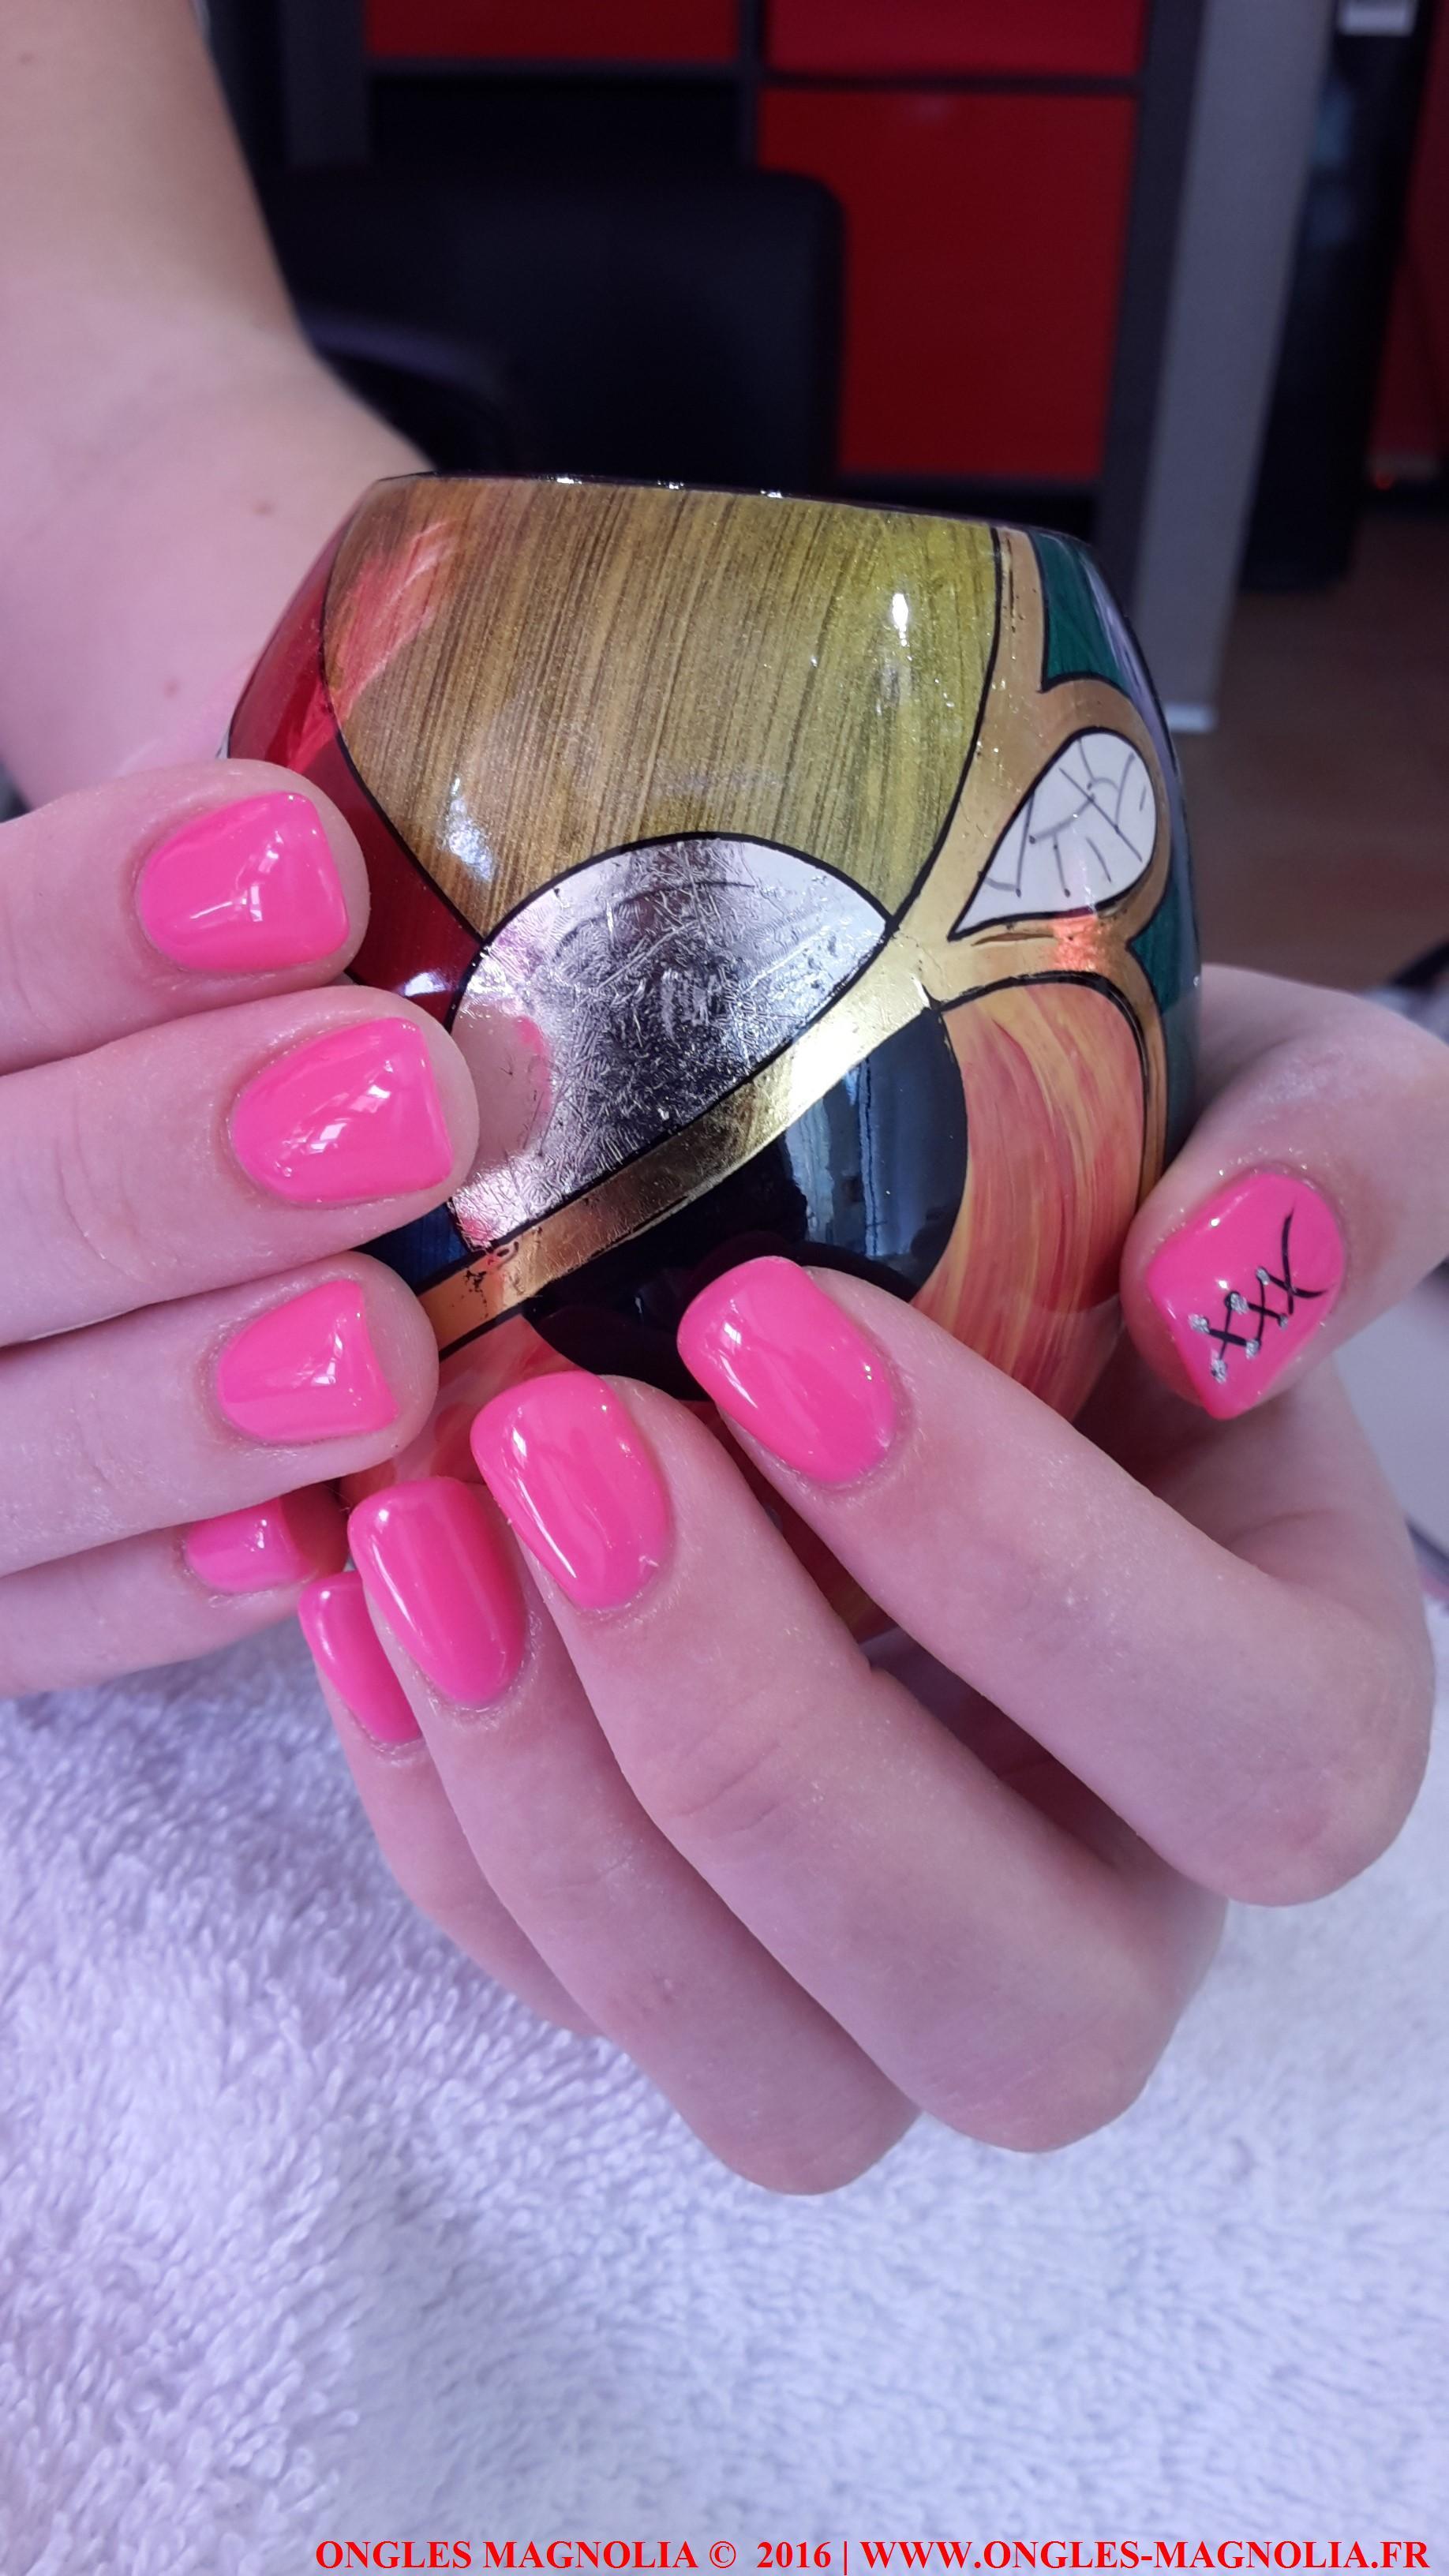 Pose-ongles-nail-art-neuville-sur-saone-lyon-ongles magnolia 052016